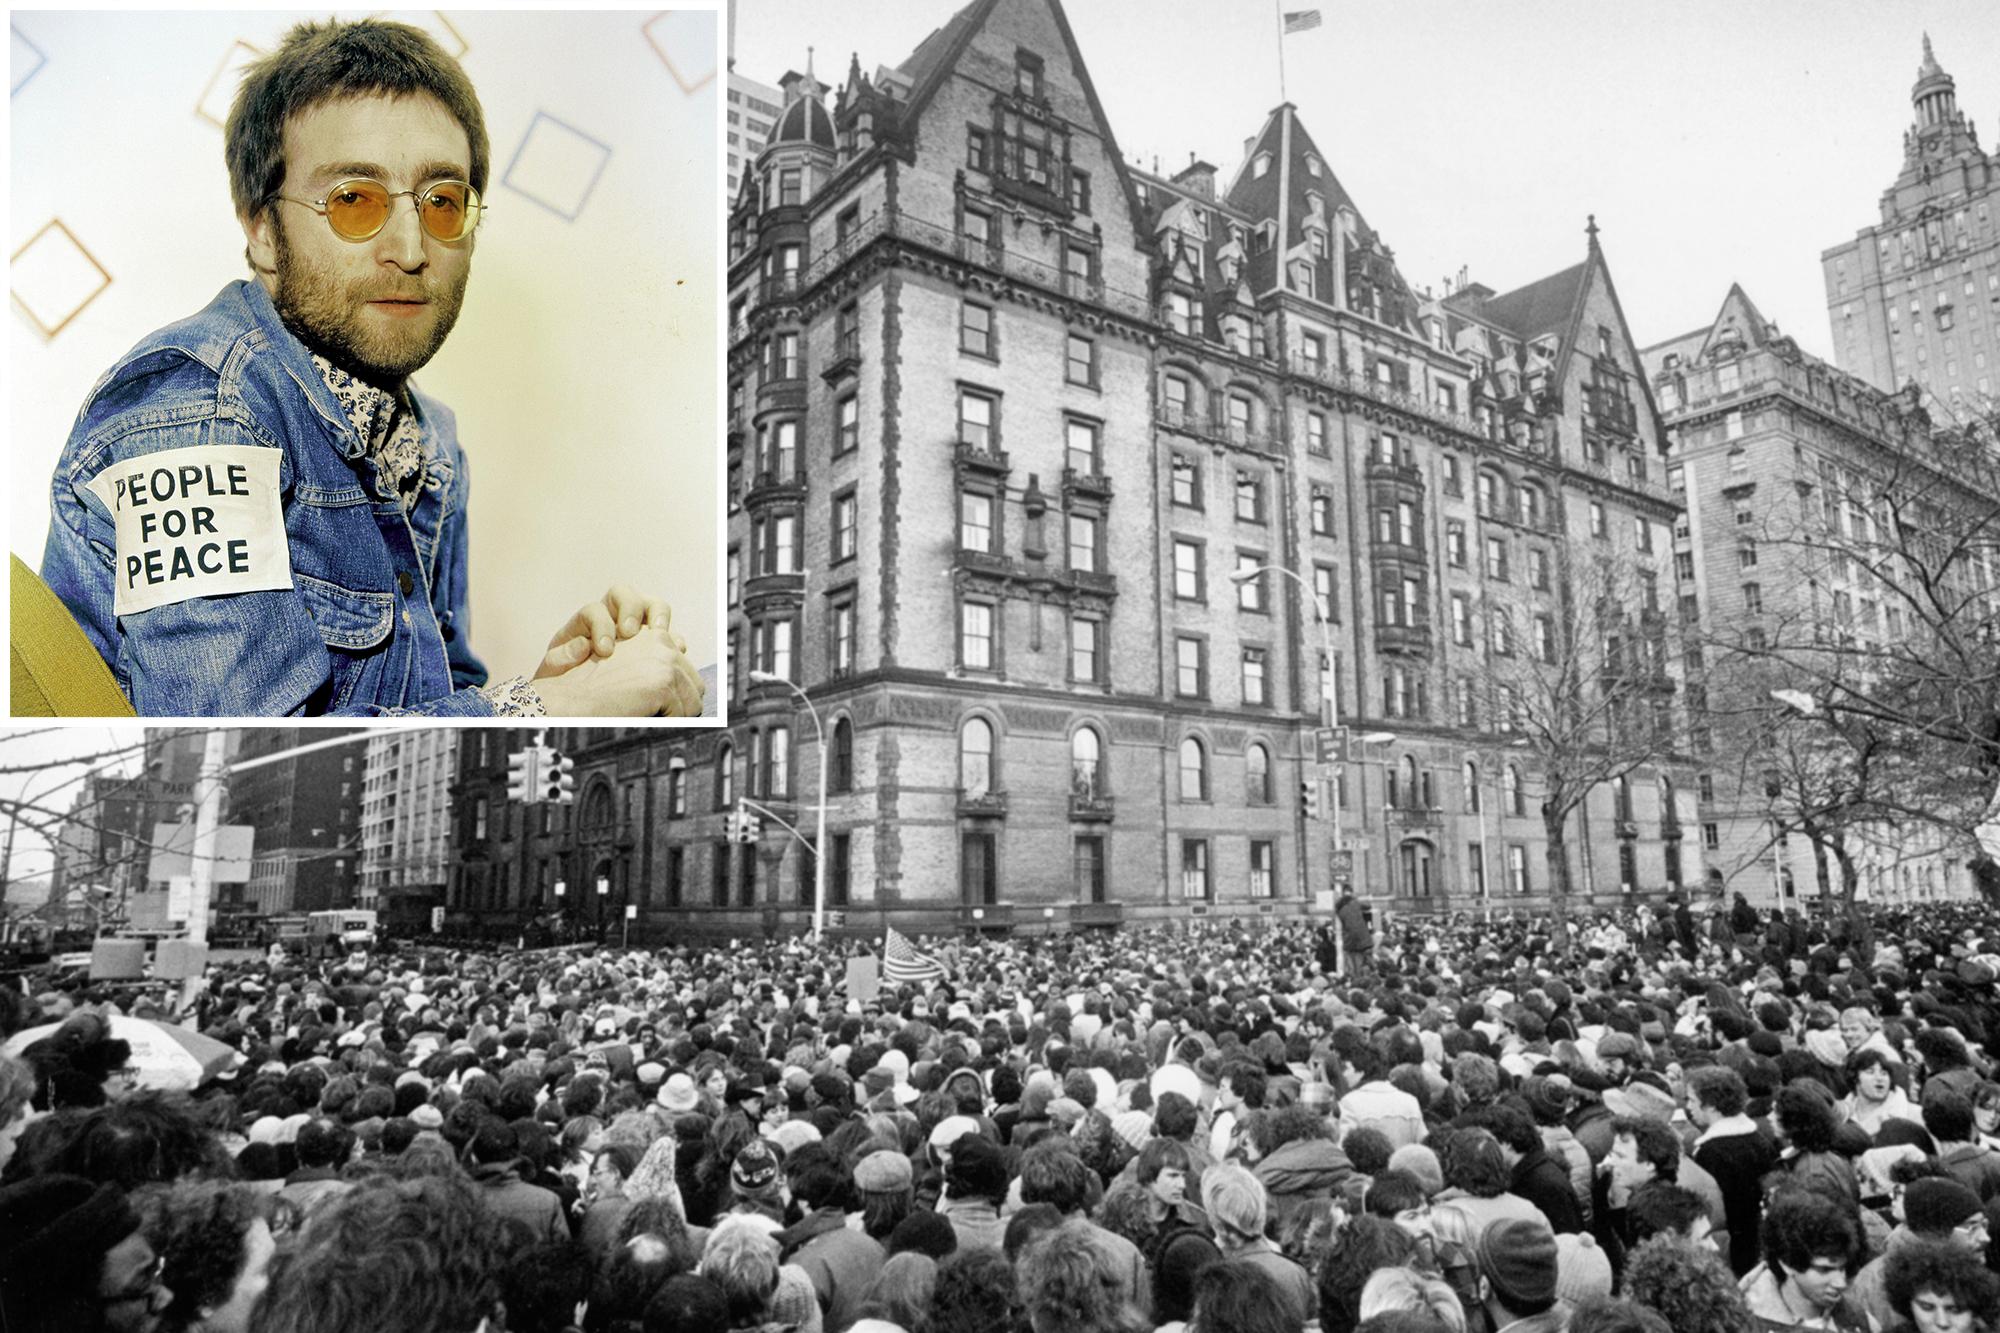 Mark David Chapman and the assassination of John Lennon